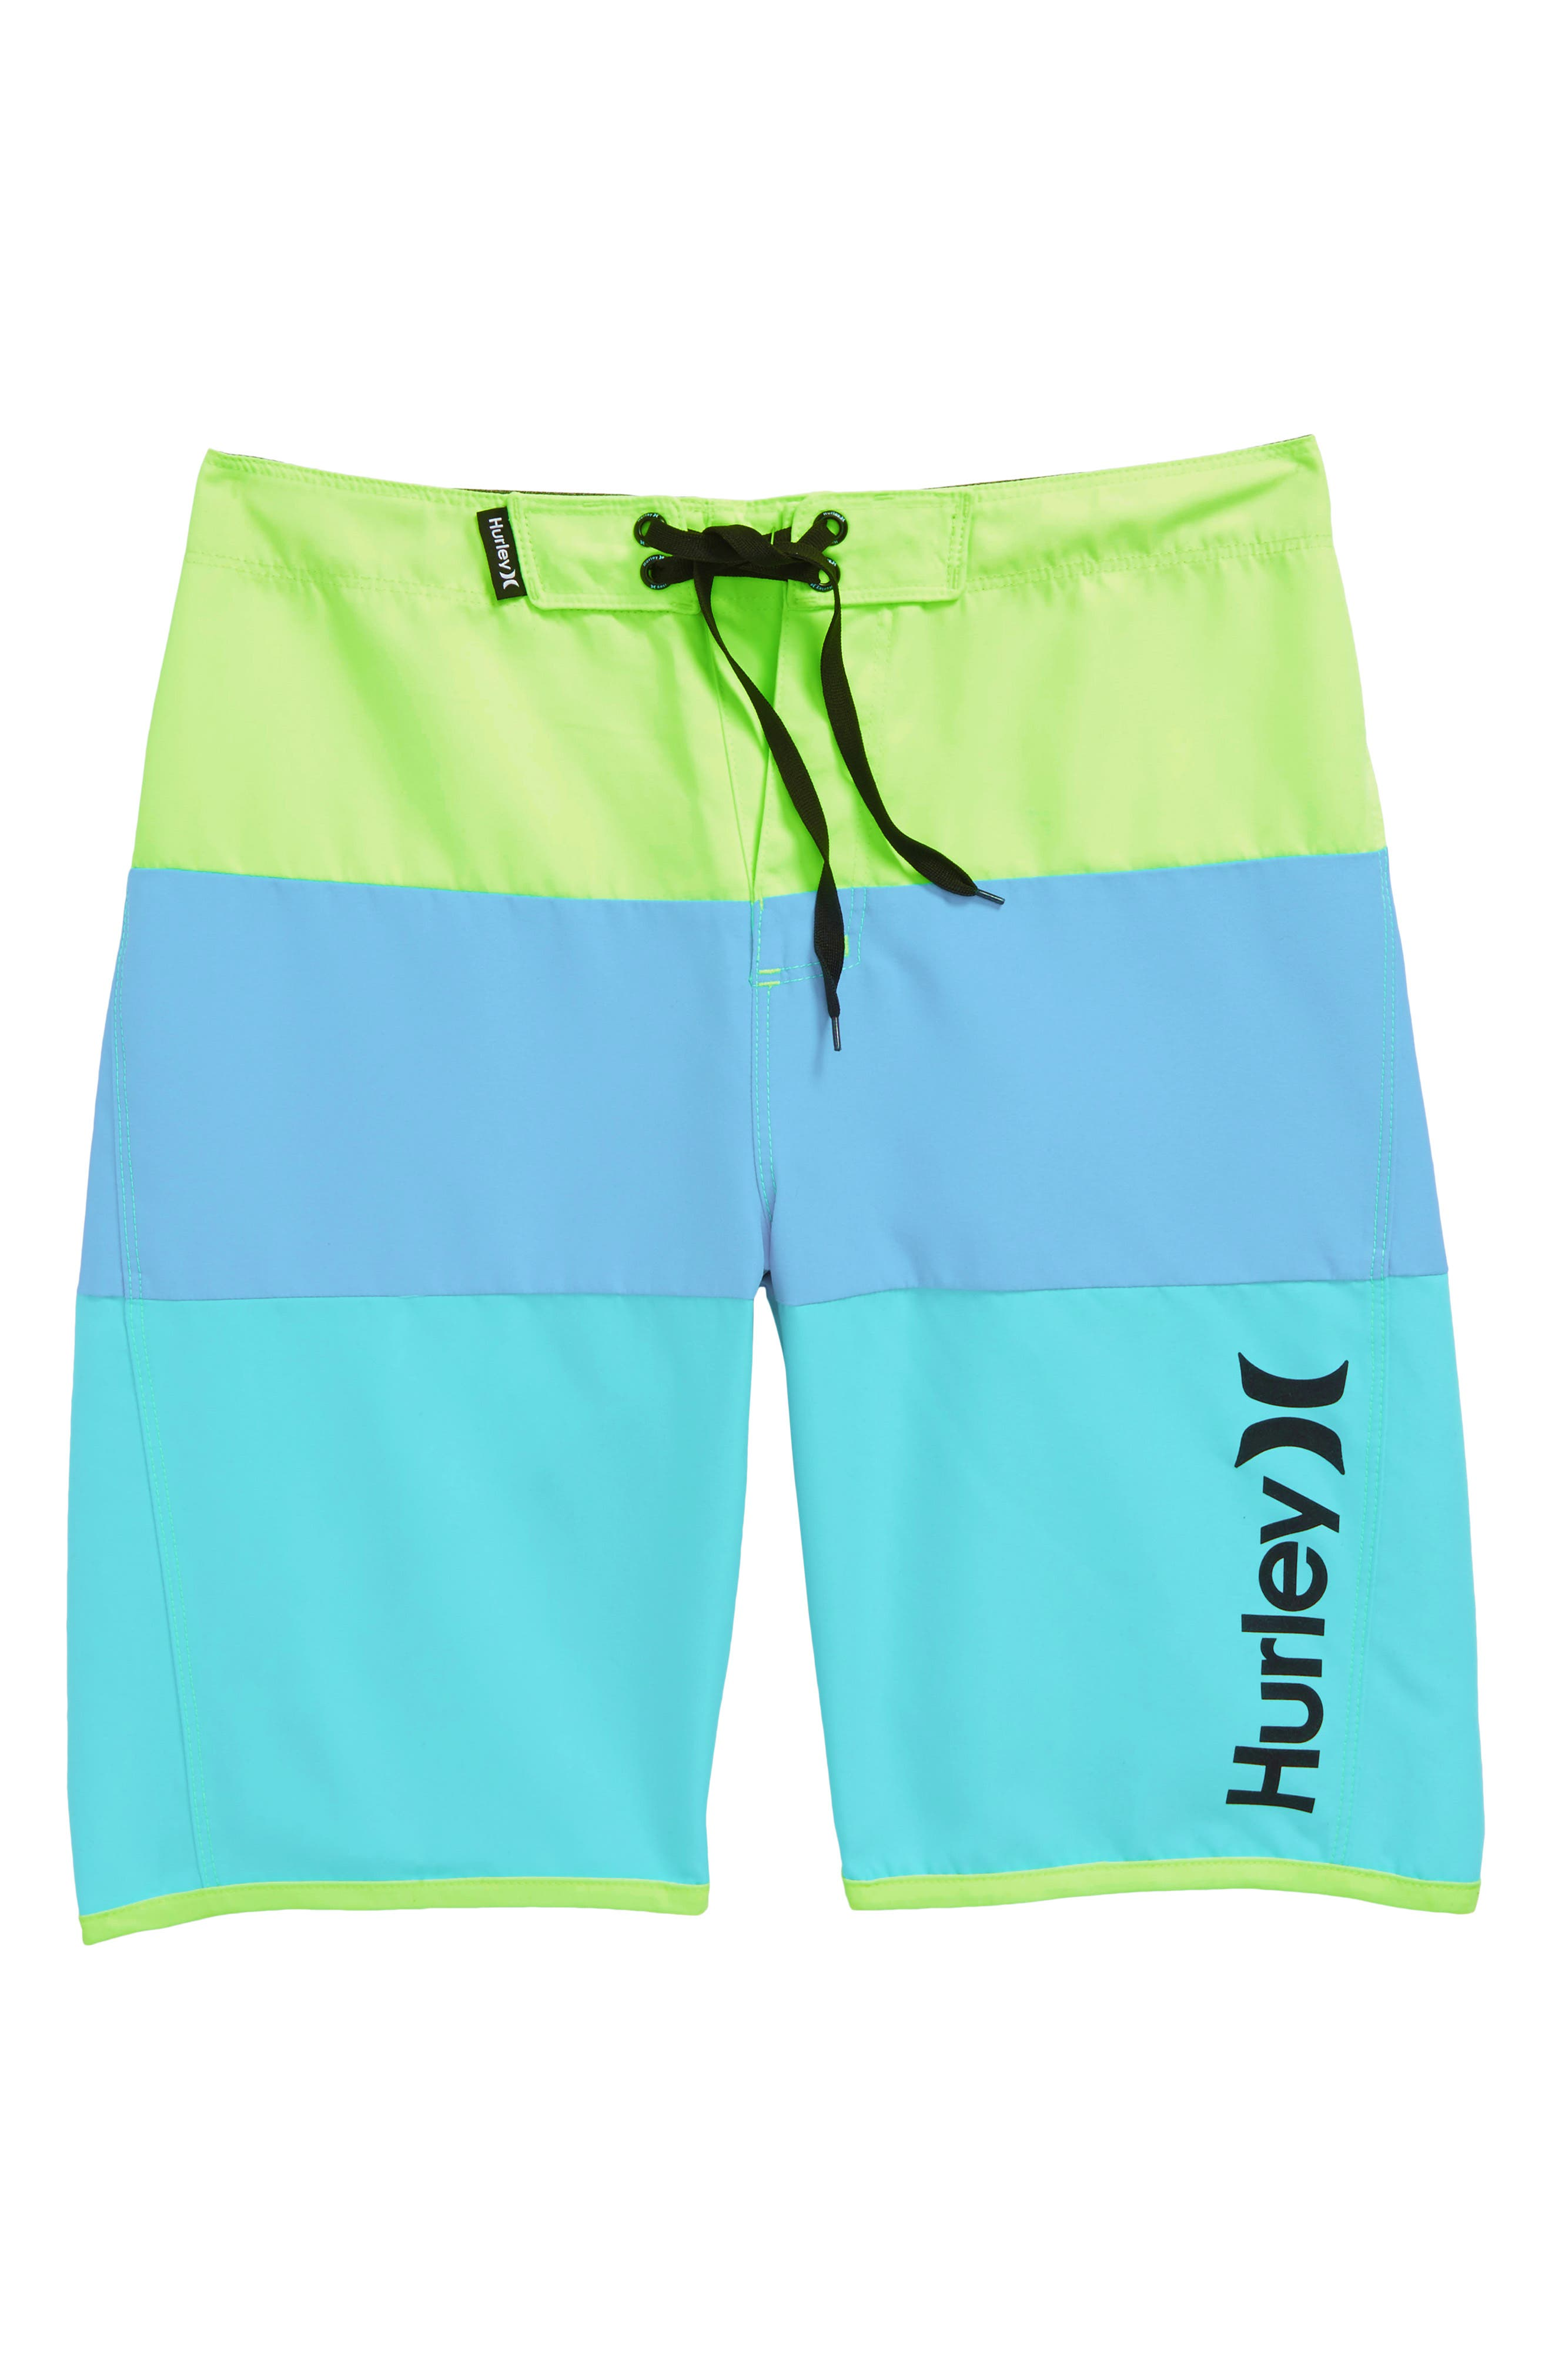 Triple Threat Board Shorts,                         Main,                         color,